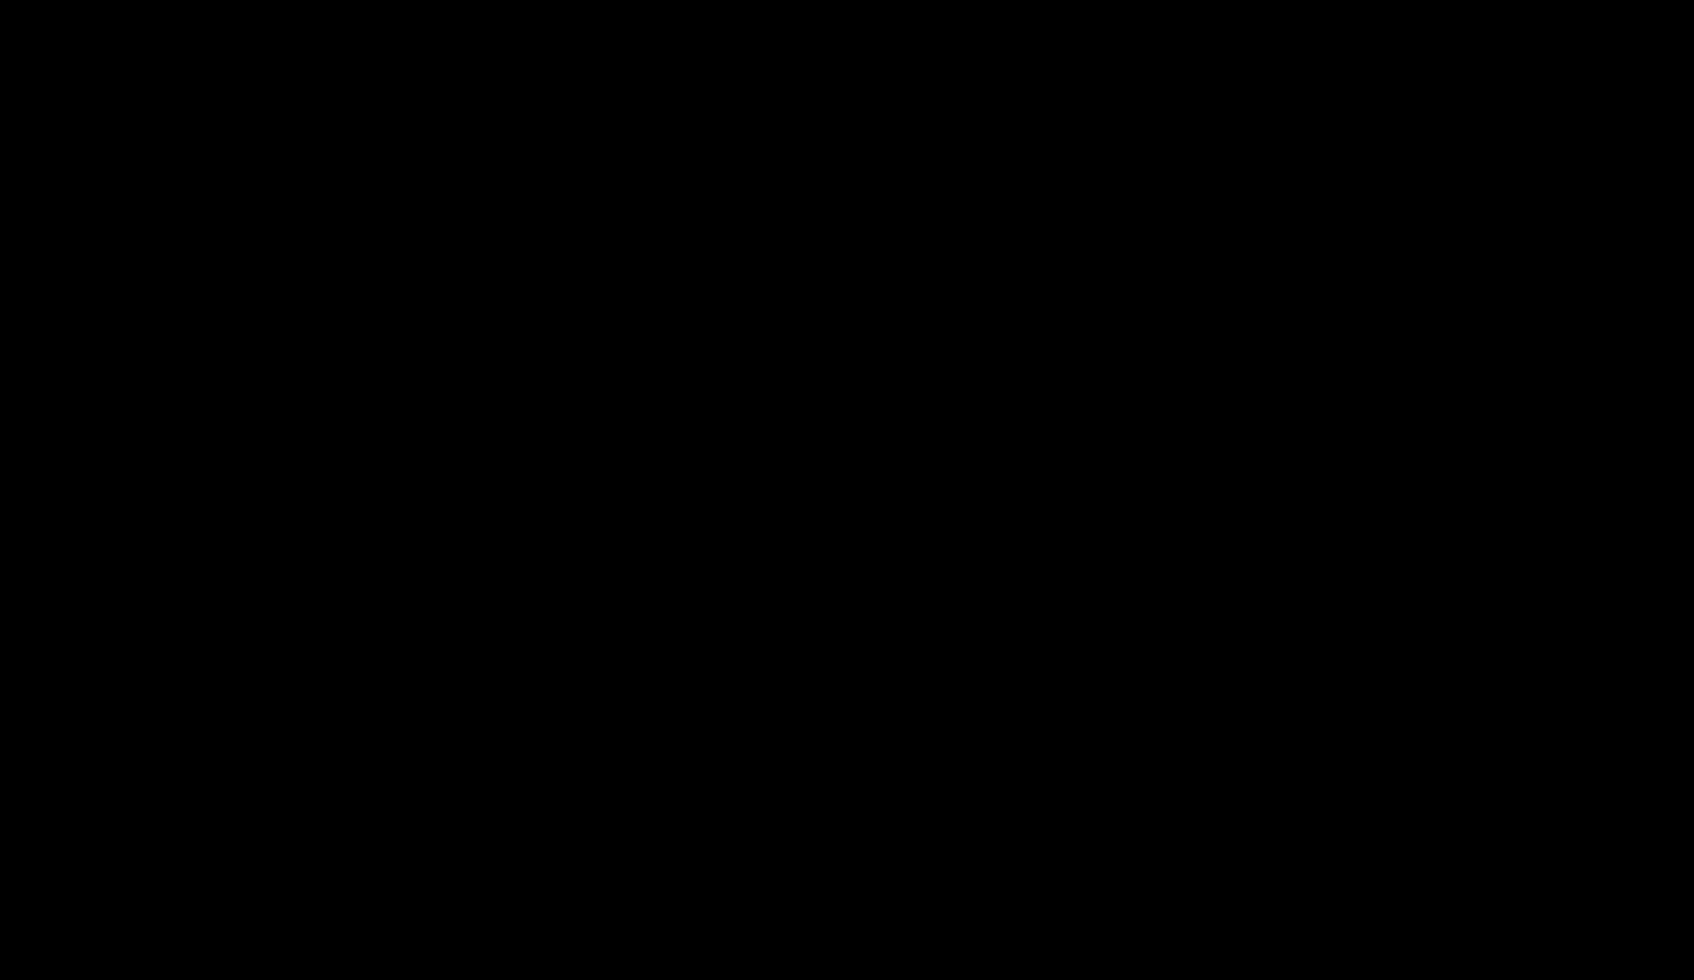 lejonhuvud png